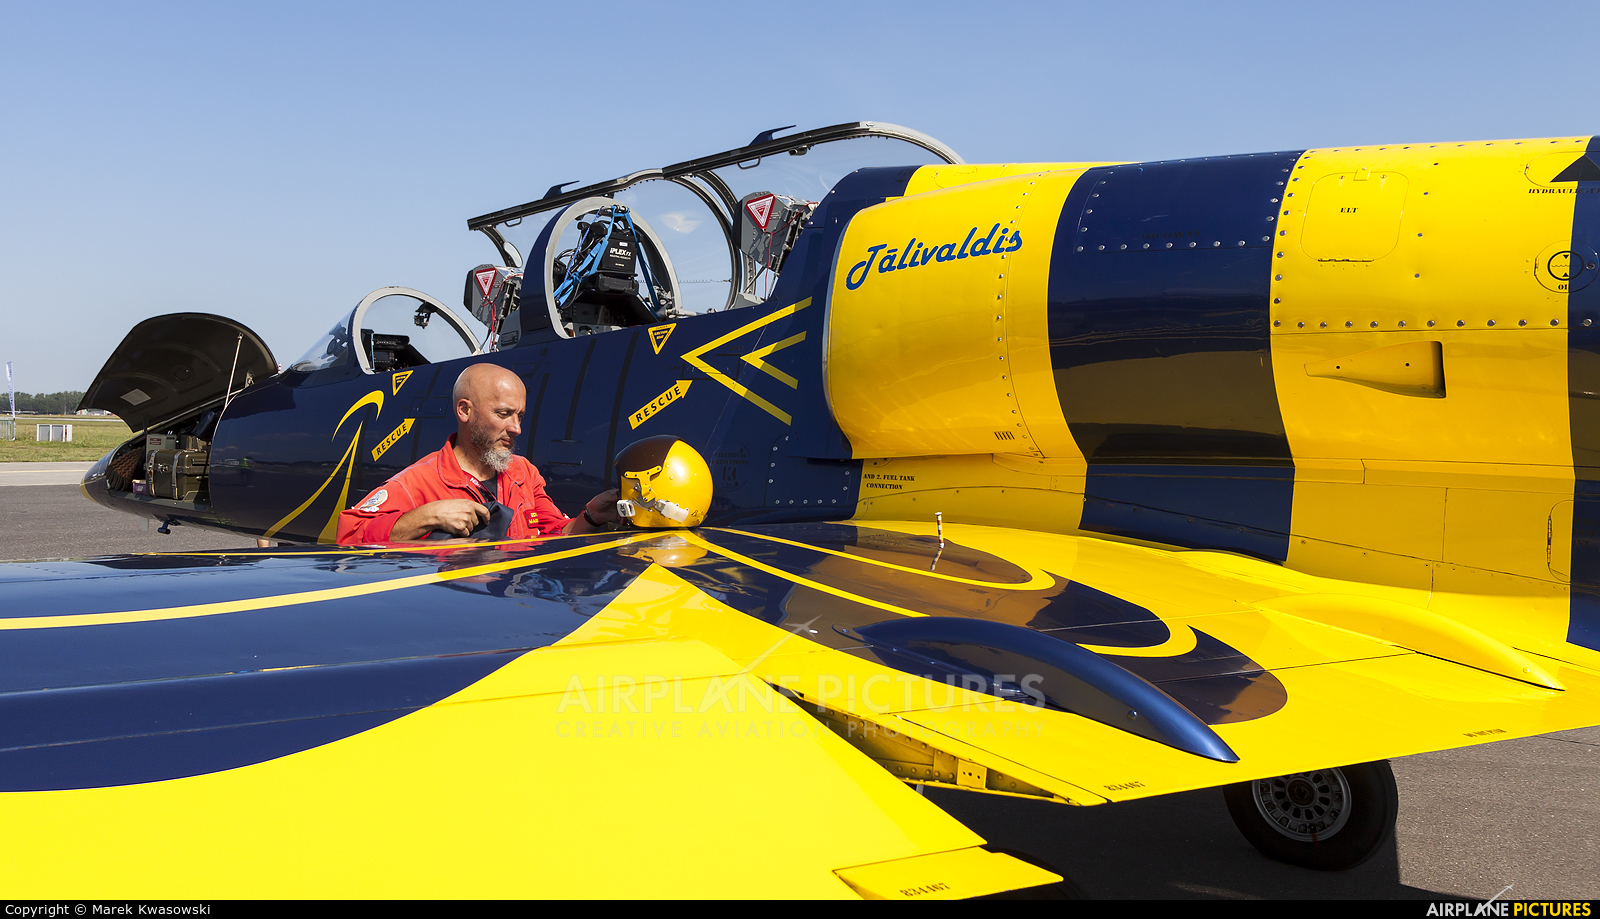 Baltic Bees Jet Team YL-KST aircraft at Gdynia- Babie Doły (Oksywie)